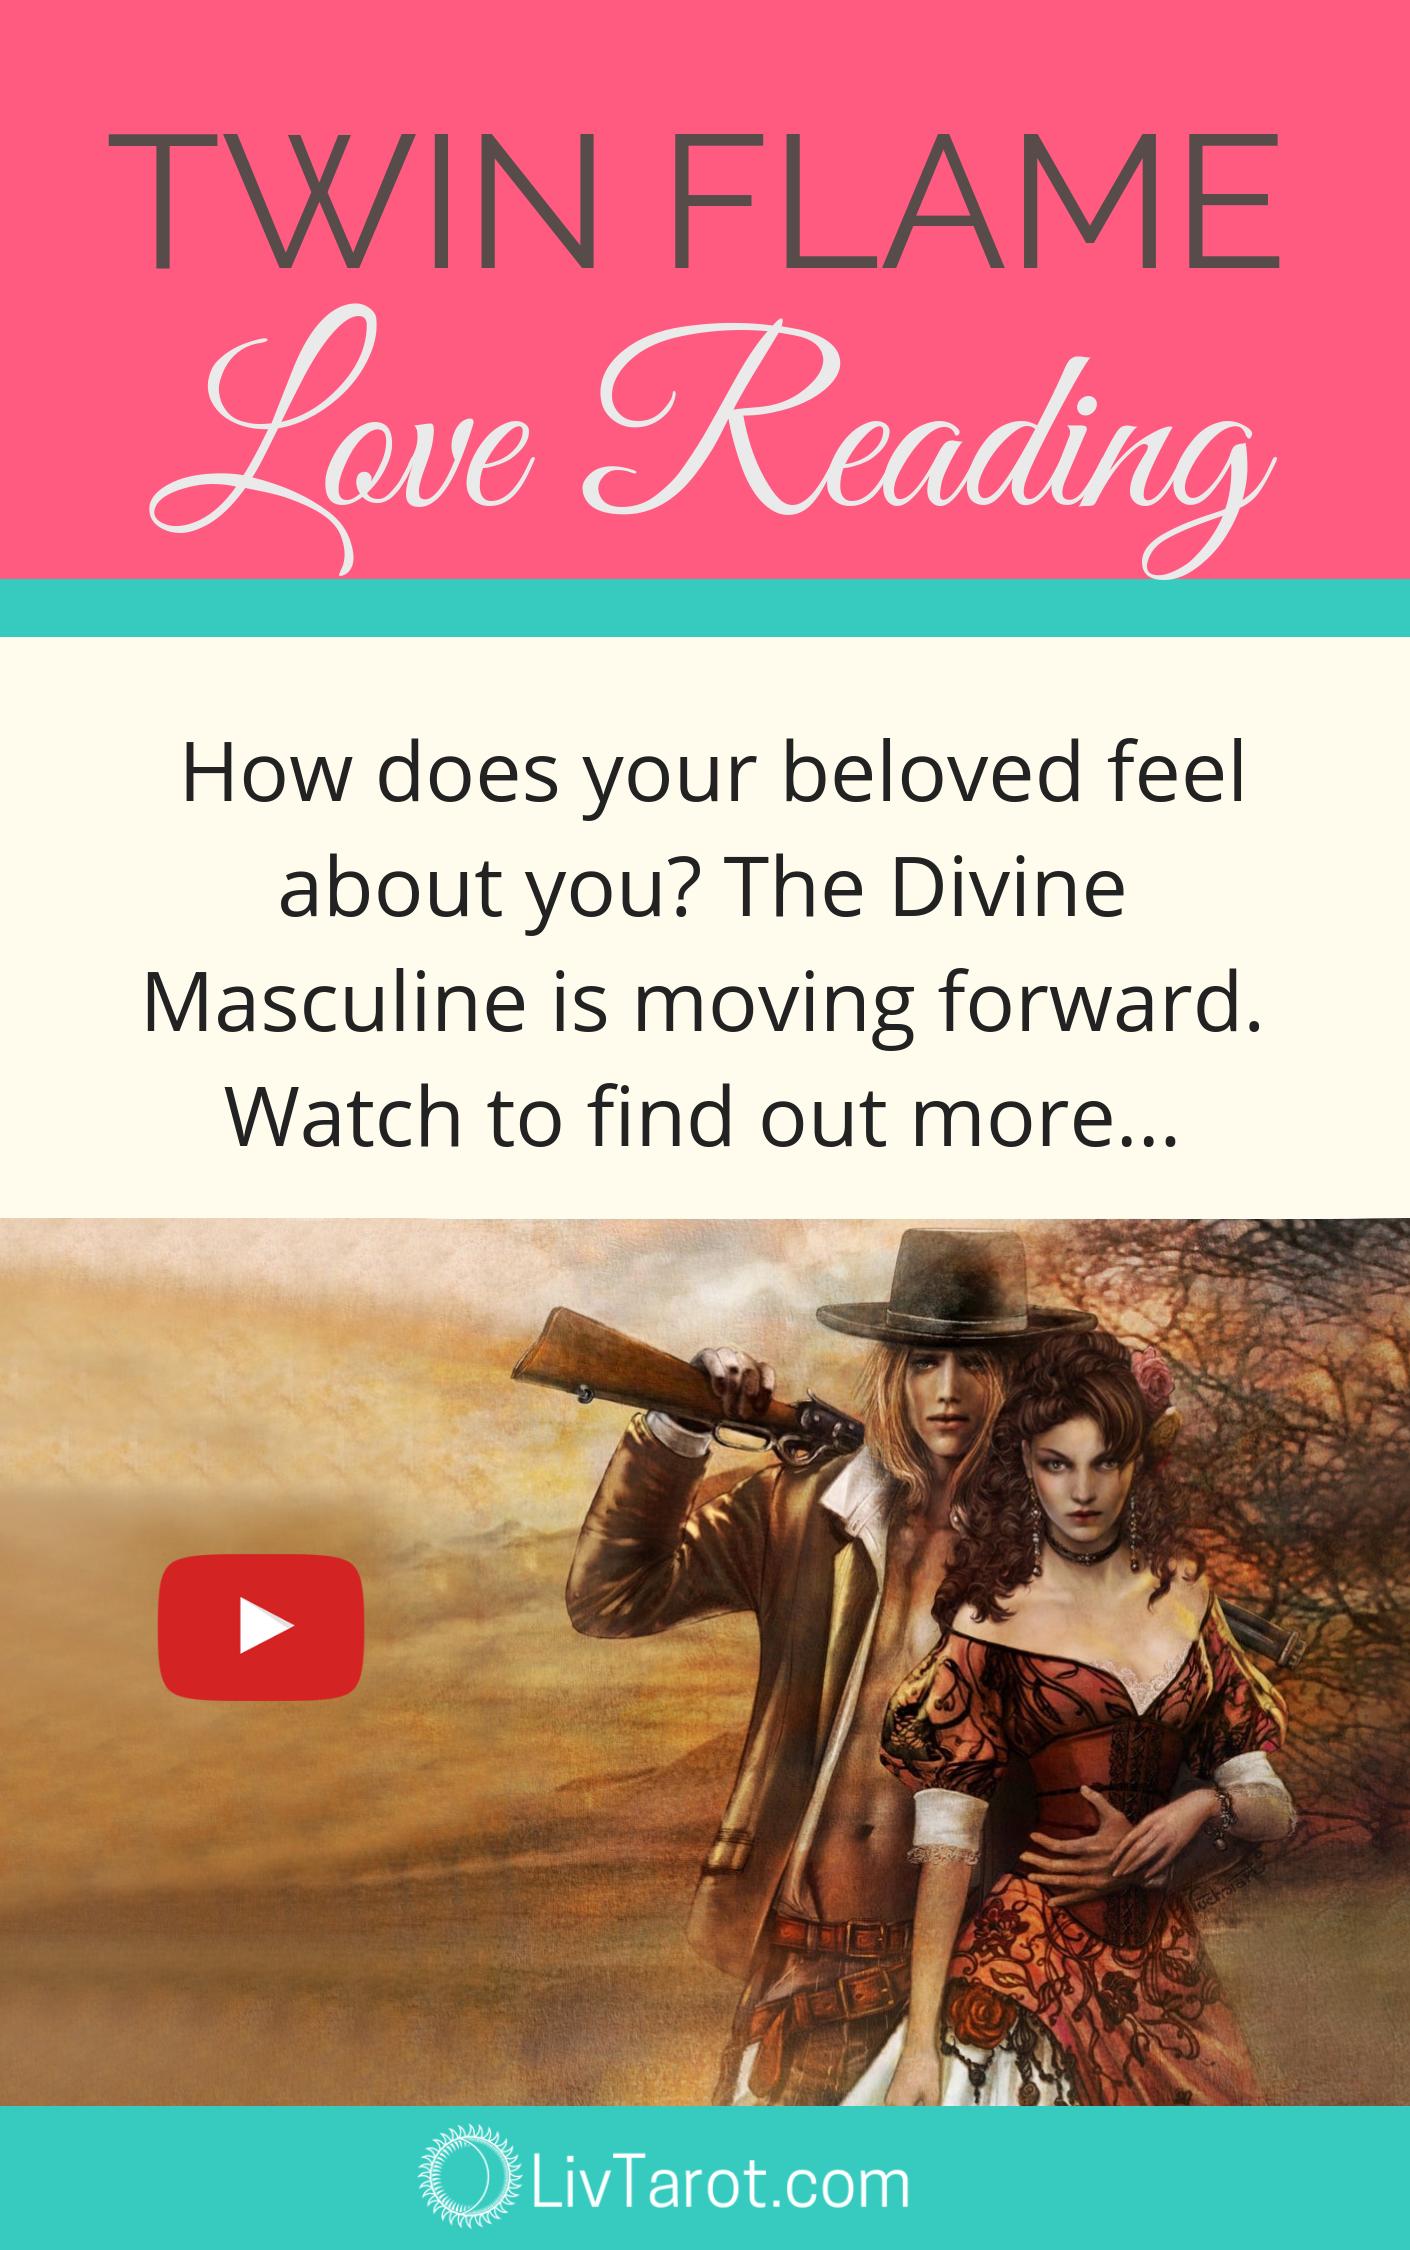 Blog | LivTarot Blog | Tarot learning, Free tarot reading, Free tarot